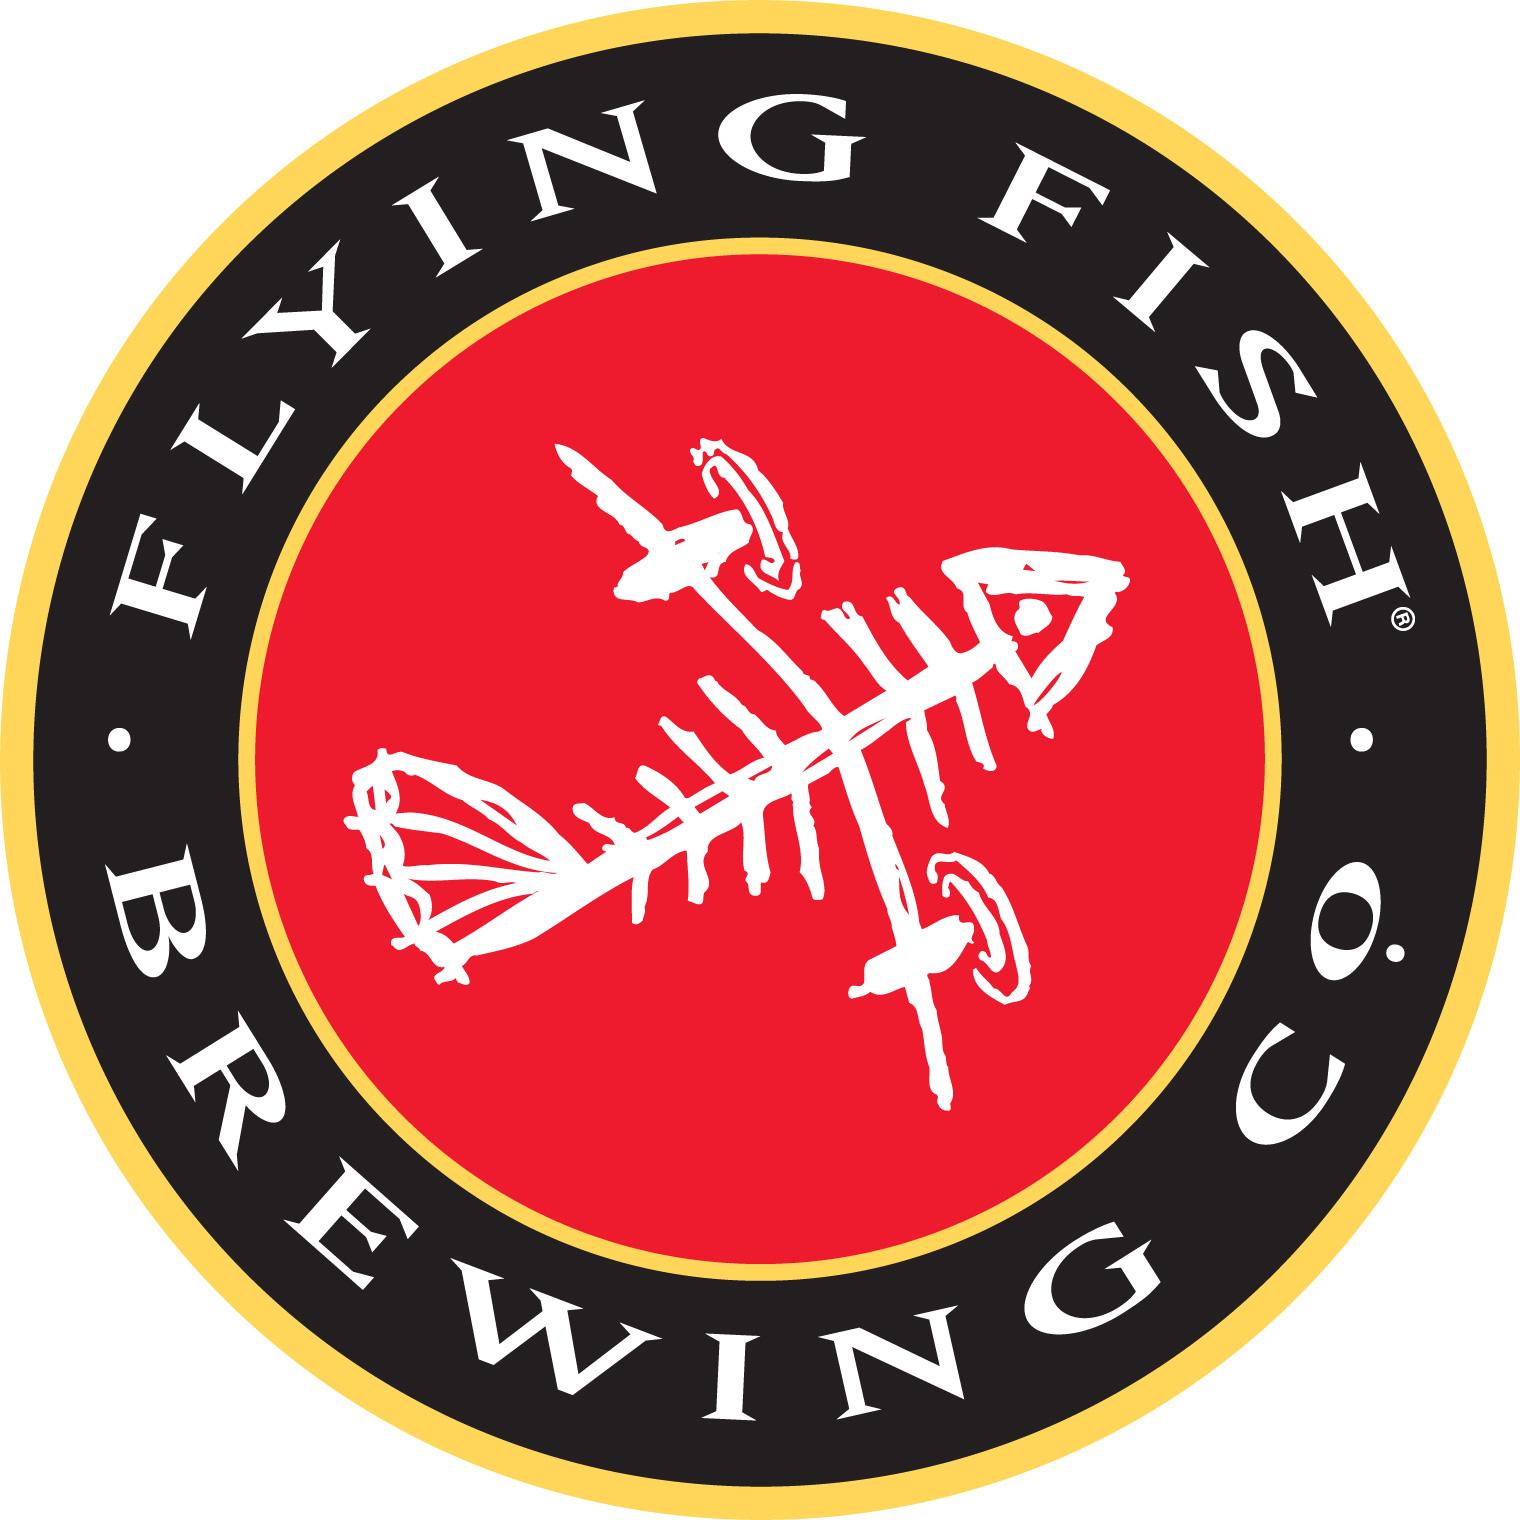 Flying Fish Brewing Company logo